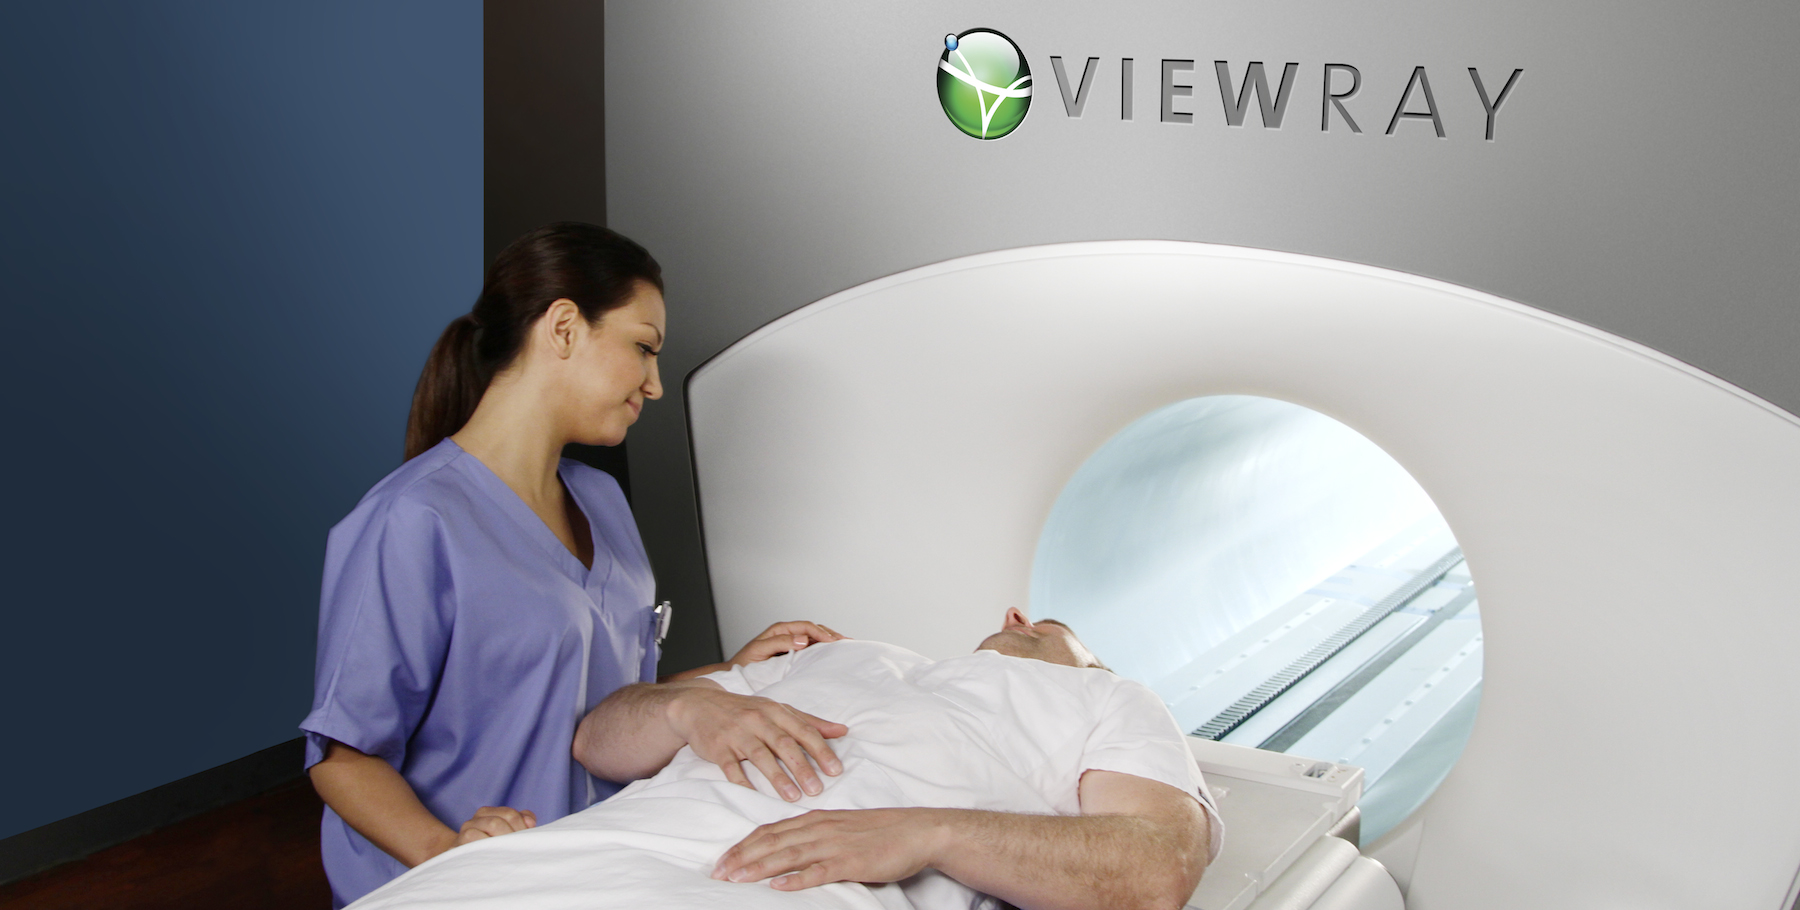 MRIdian MRI-basierte IGRT Viewray